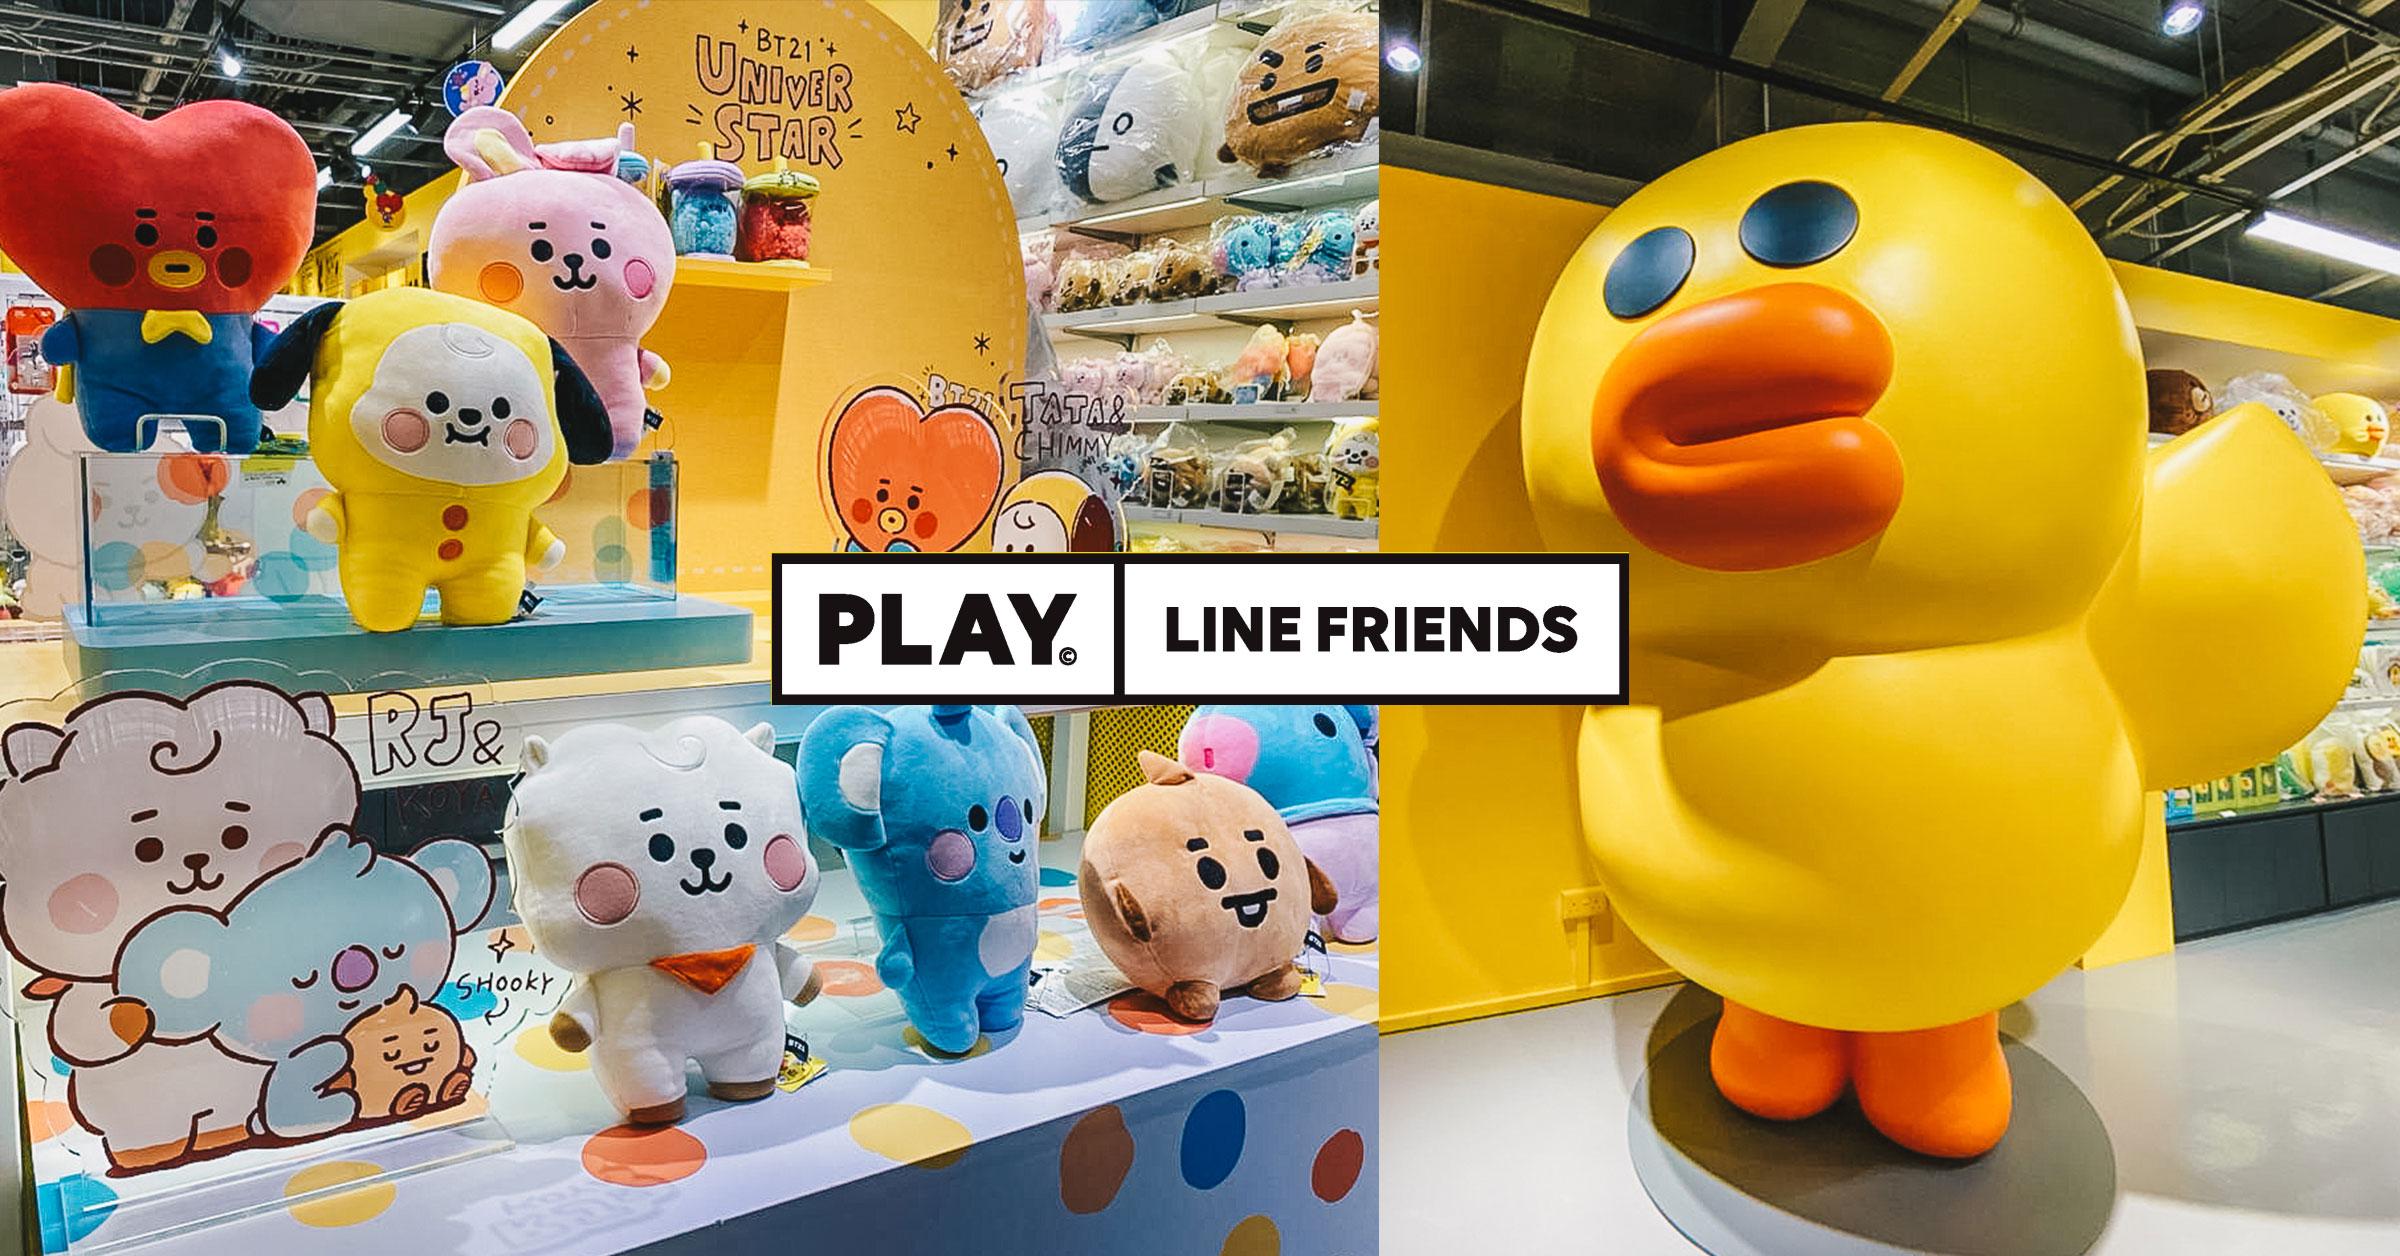 PLAY-LINE-FRIENDS-STORE-SINGAPORE-DARRENBLOGGIE